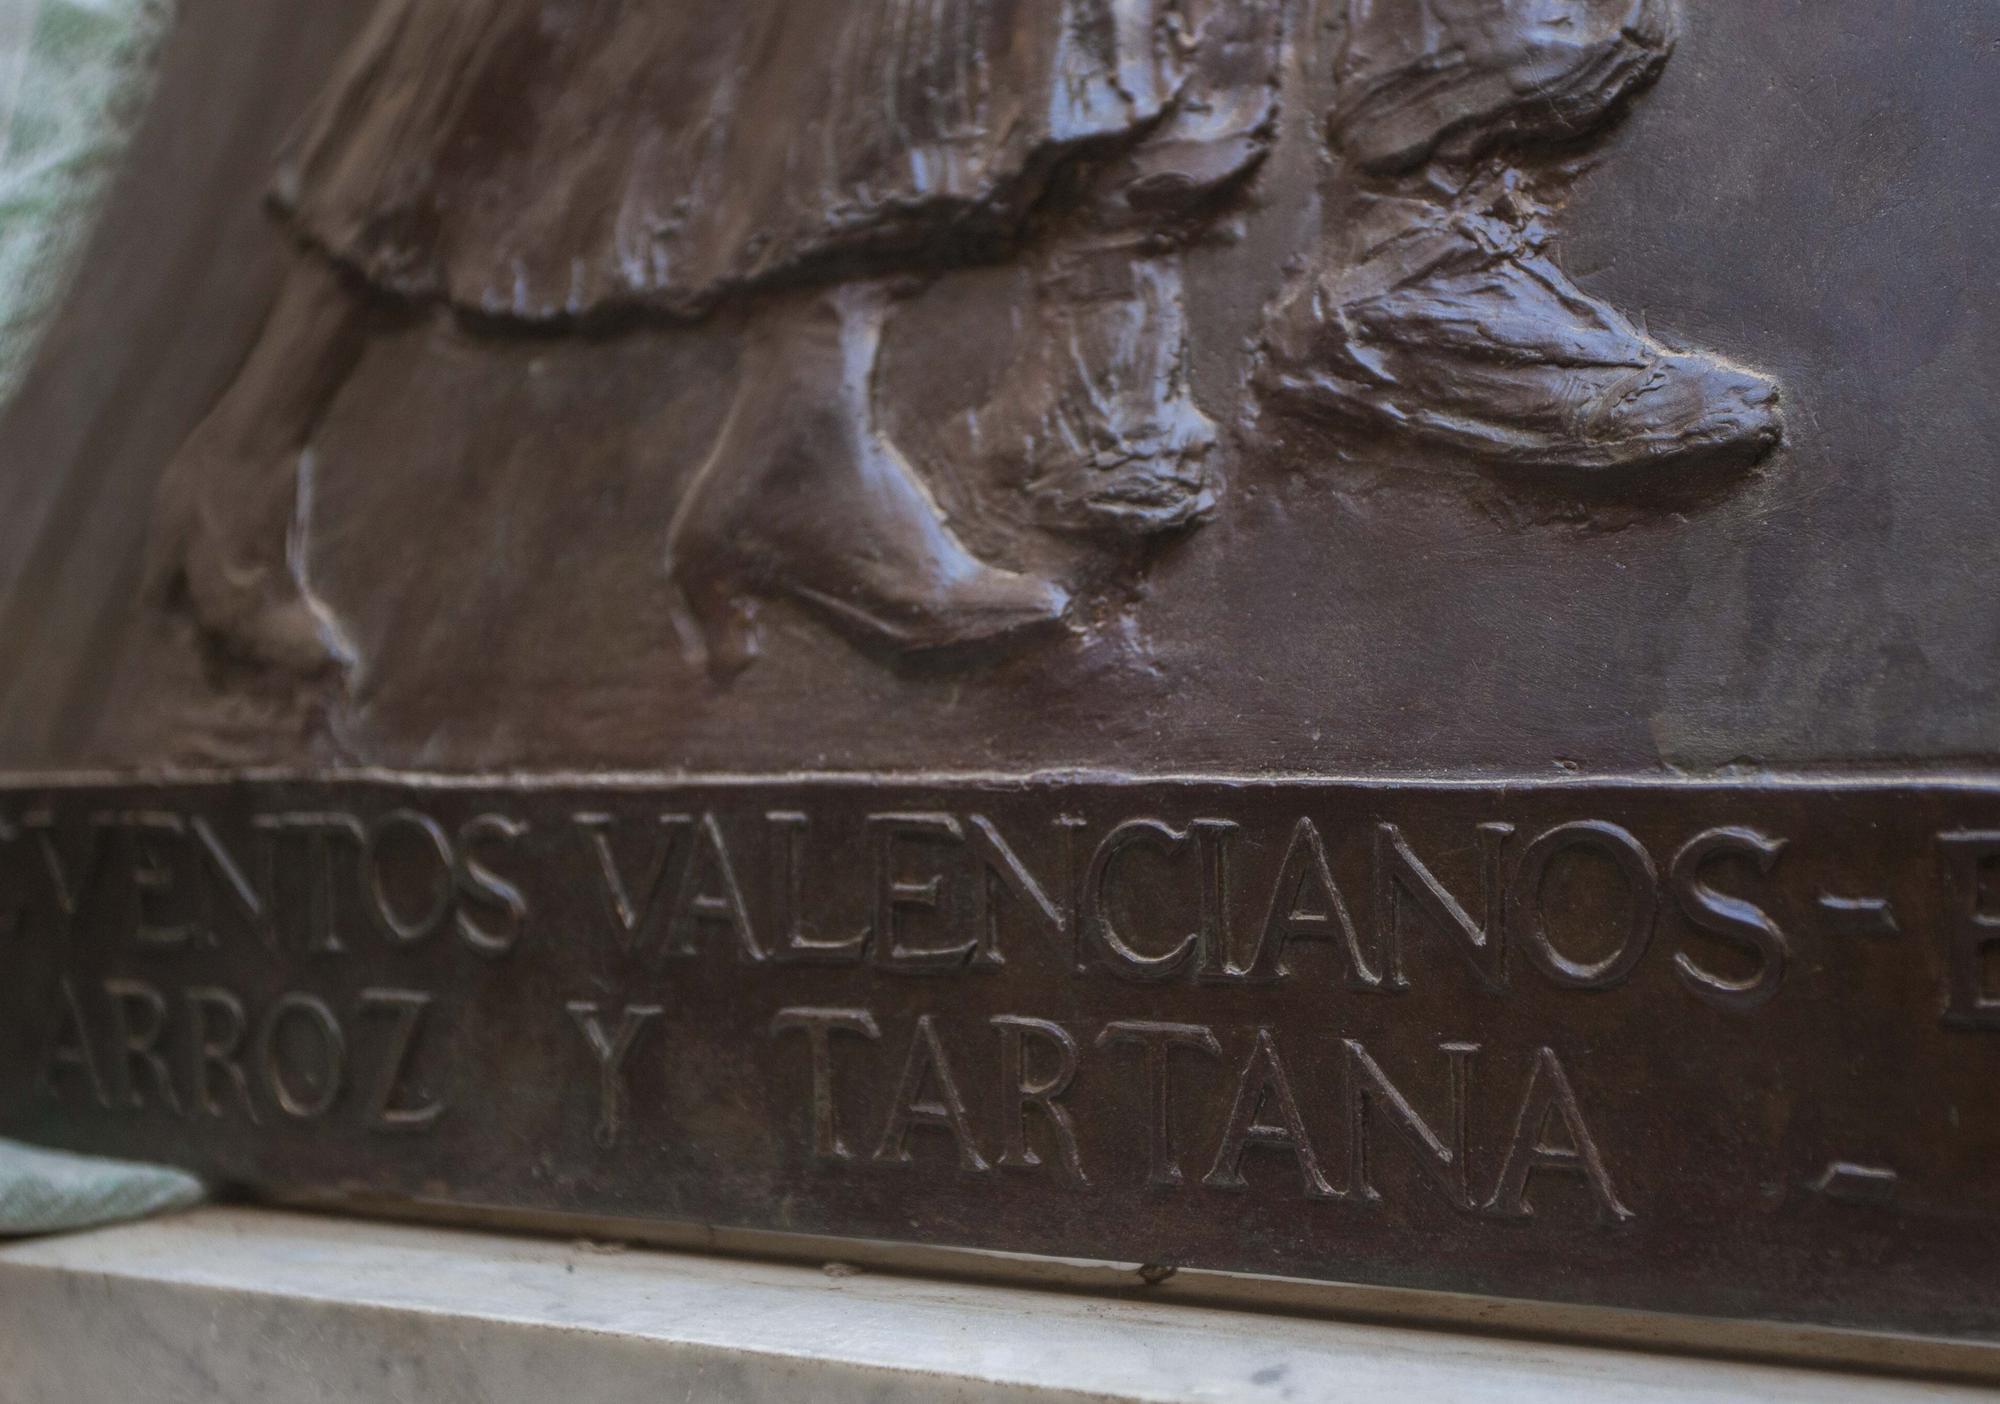 Así es el sarcófago de Blasco Ibáñez